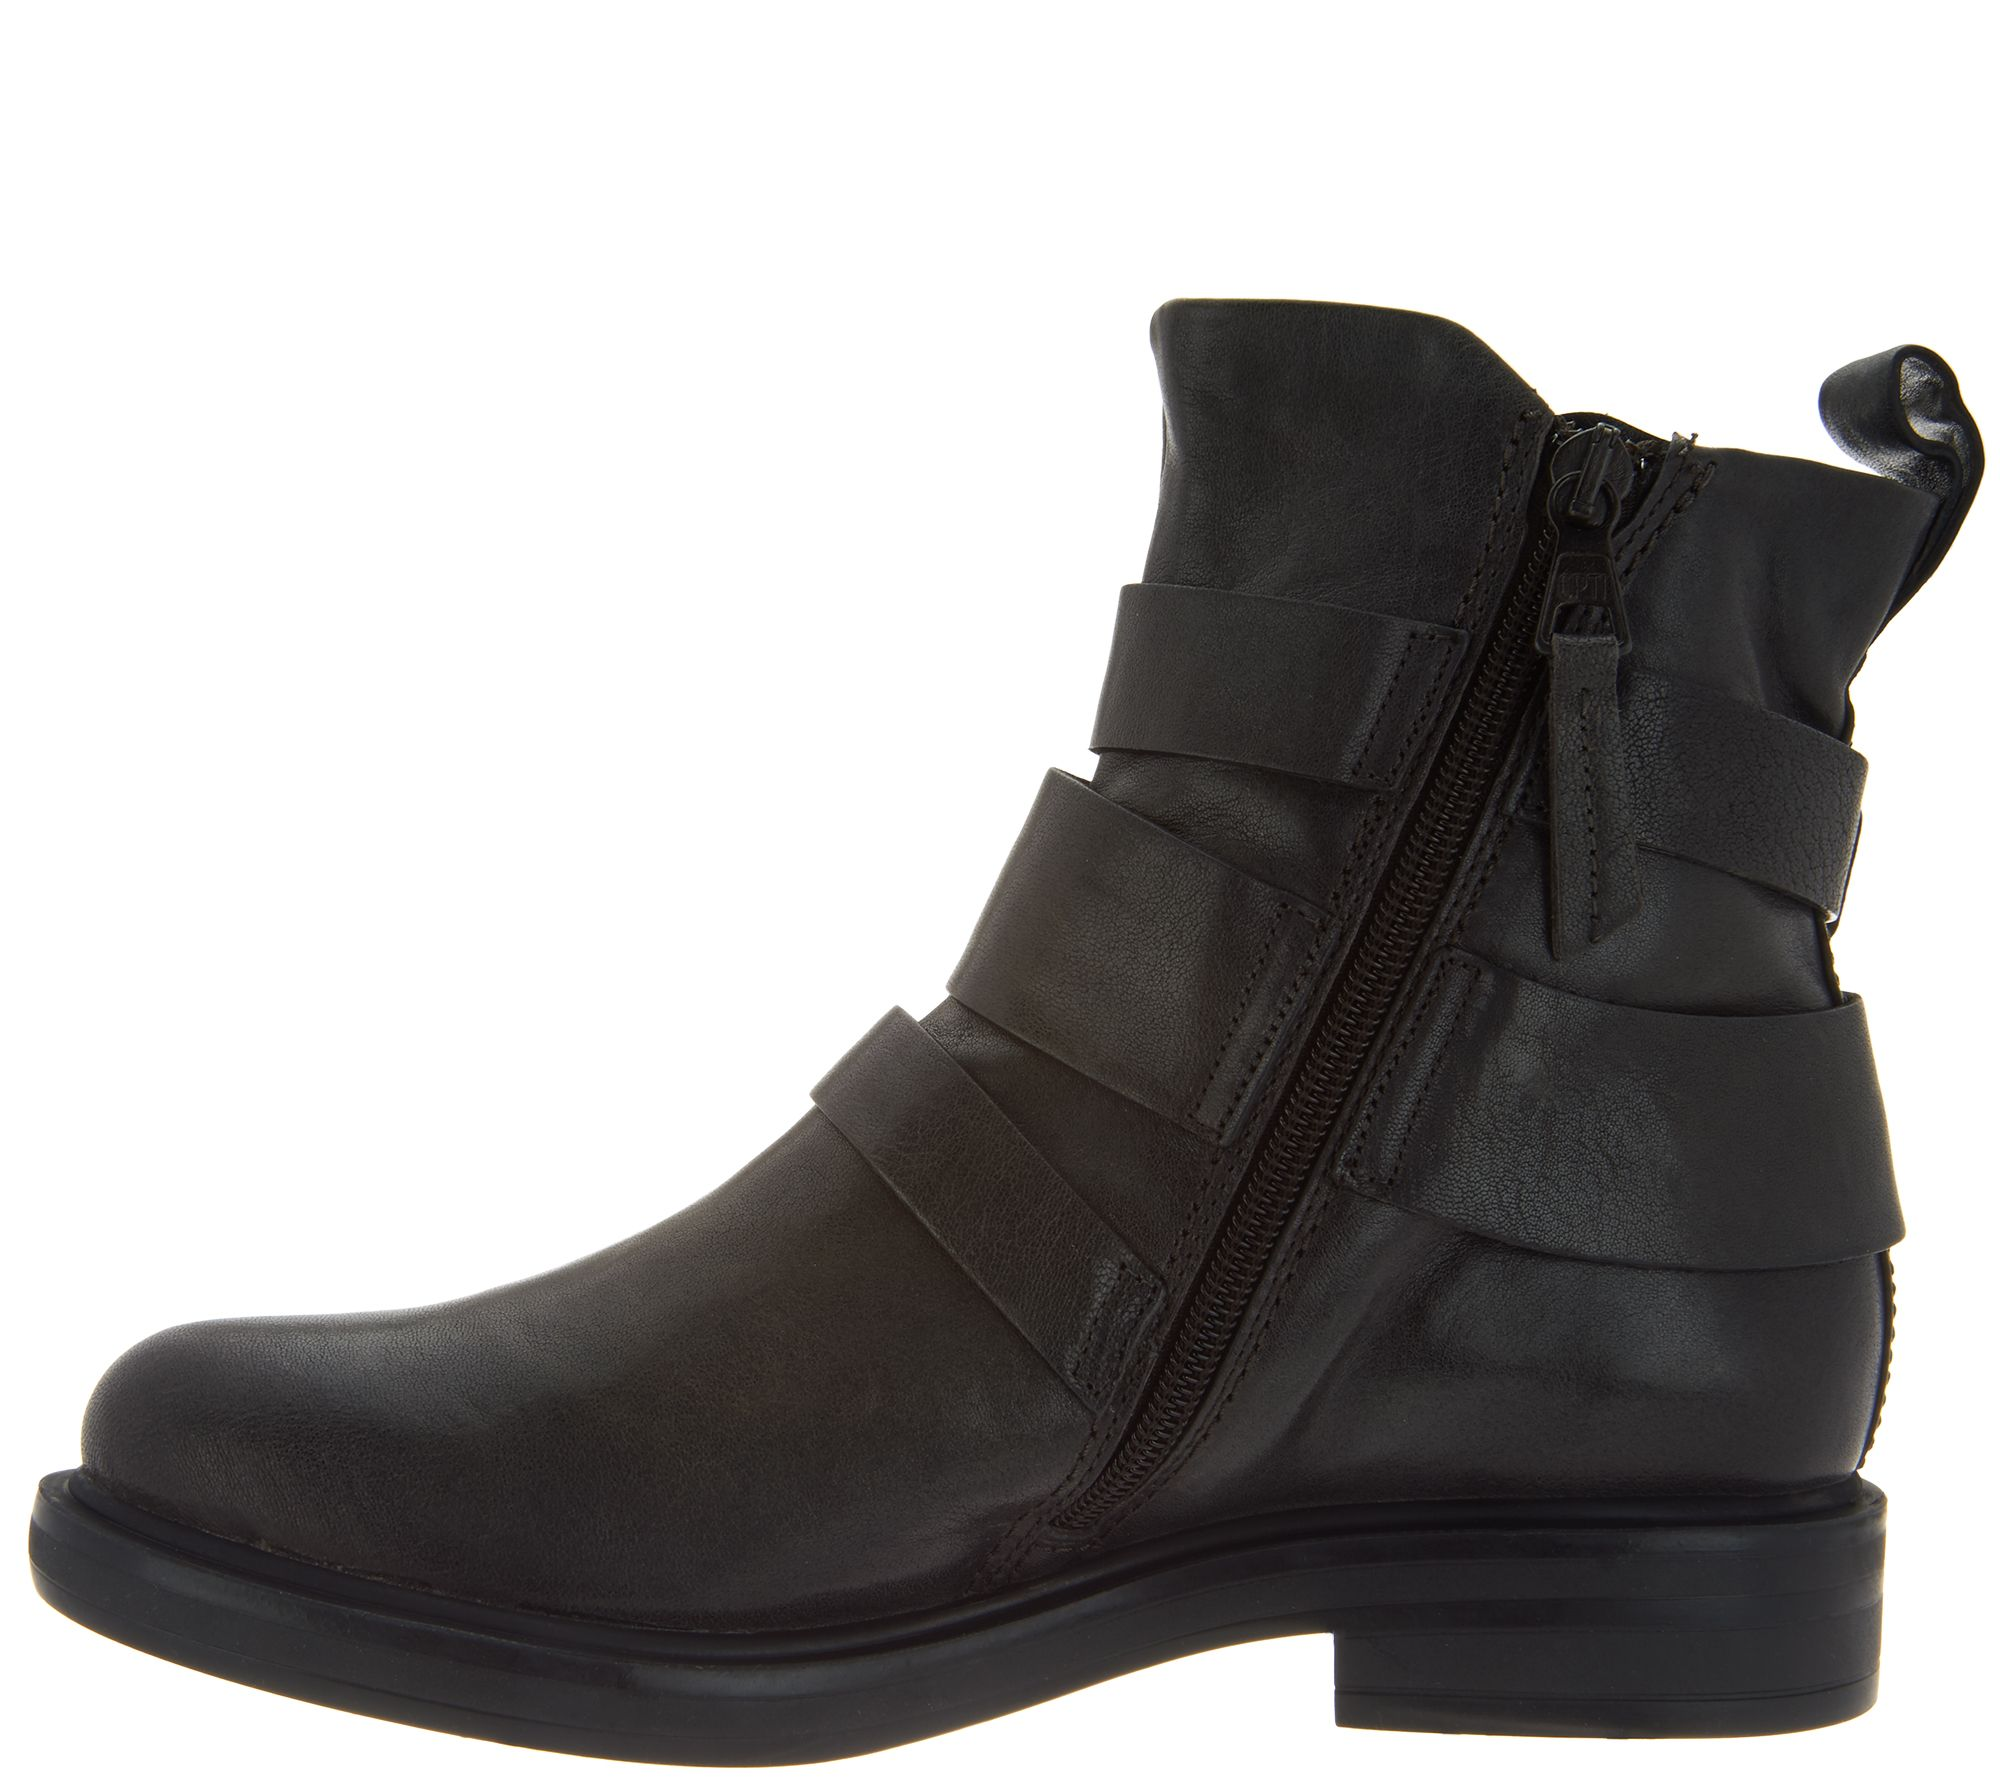 Miz Mooz Leather Triple Buckle Ankle Boots Booties Casper Gunmetal 7.5-8 EU38